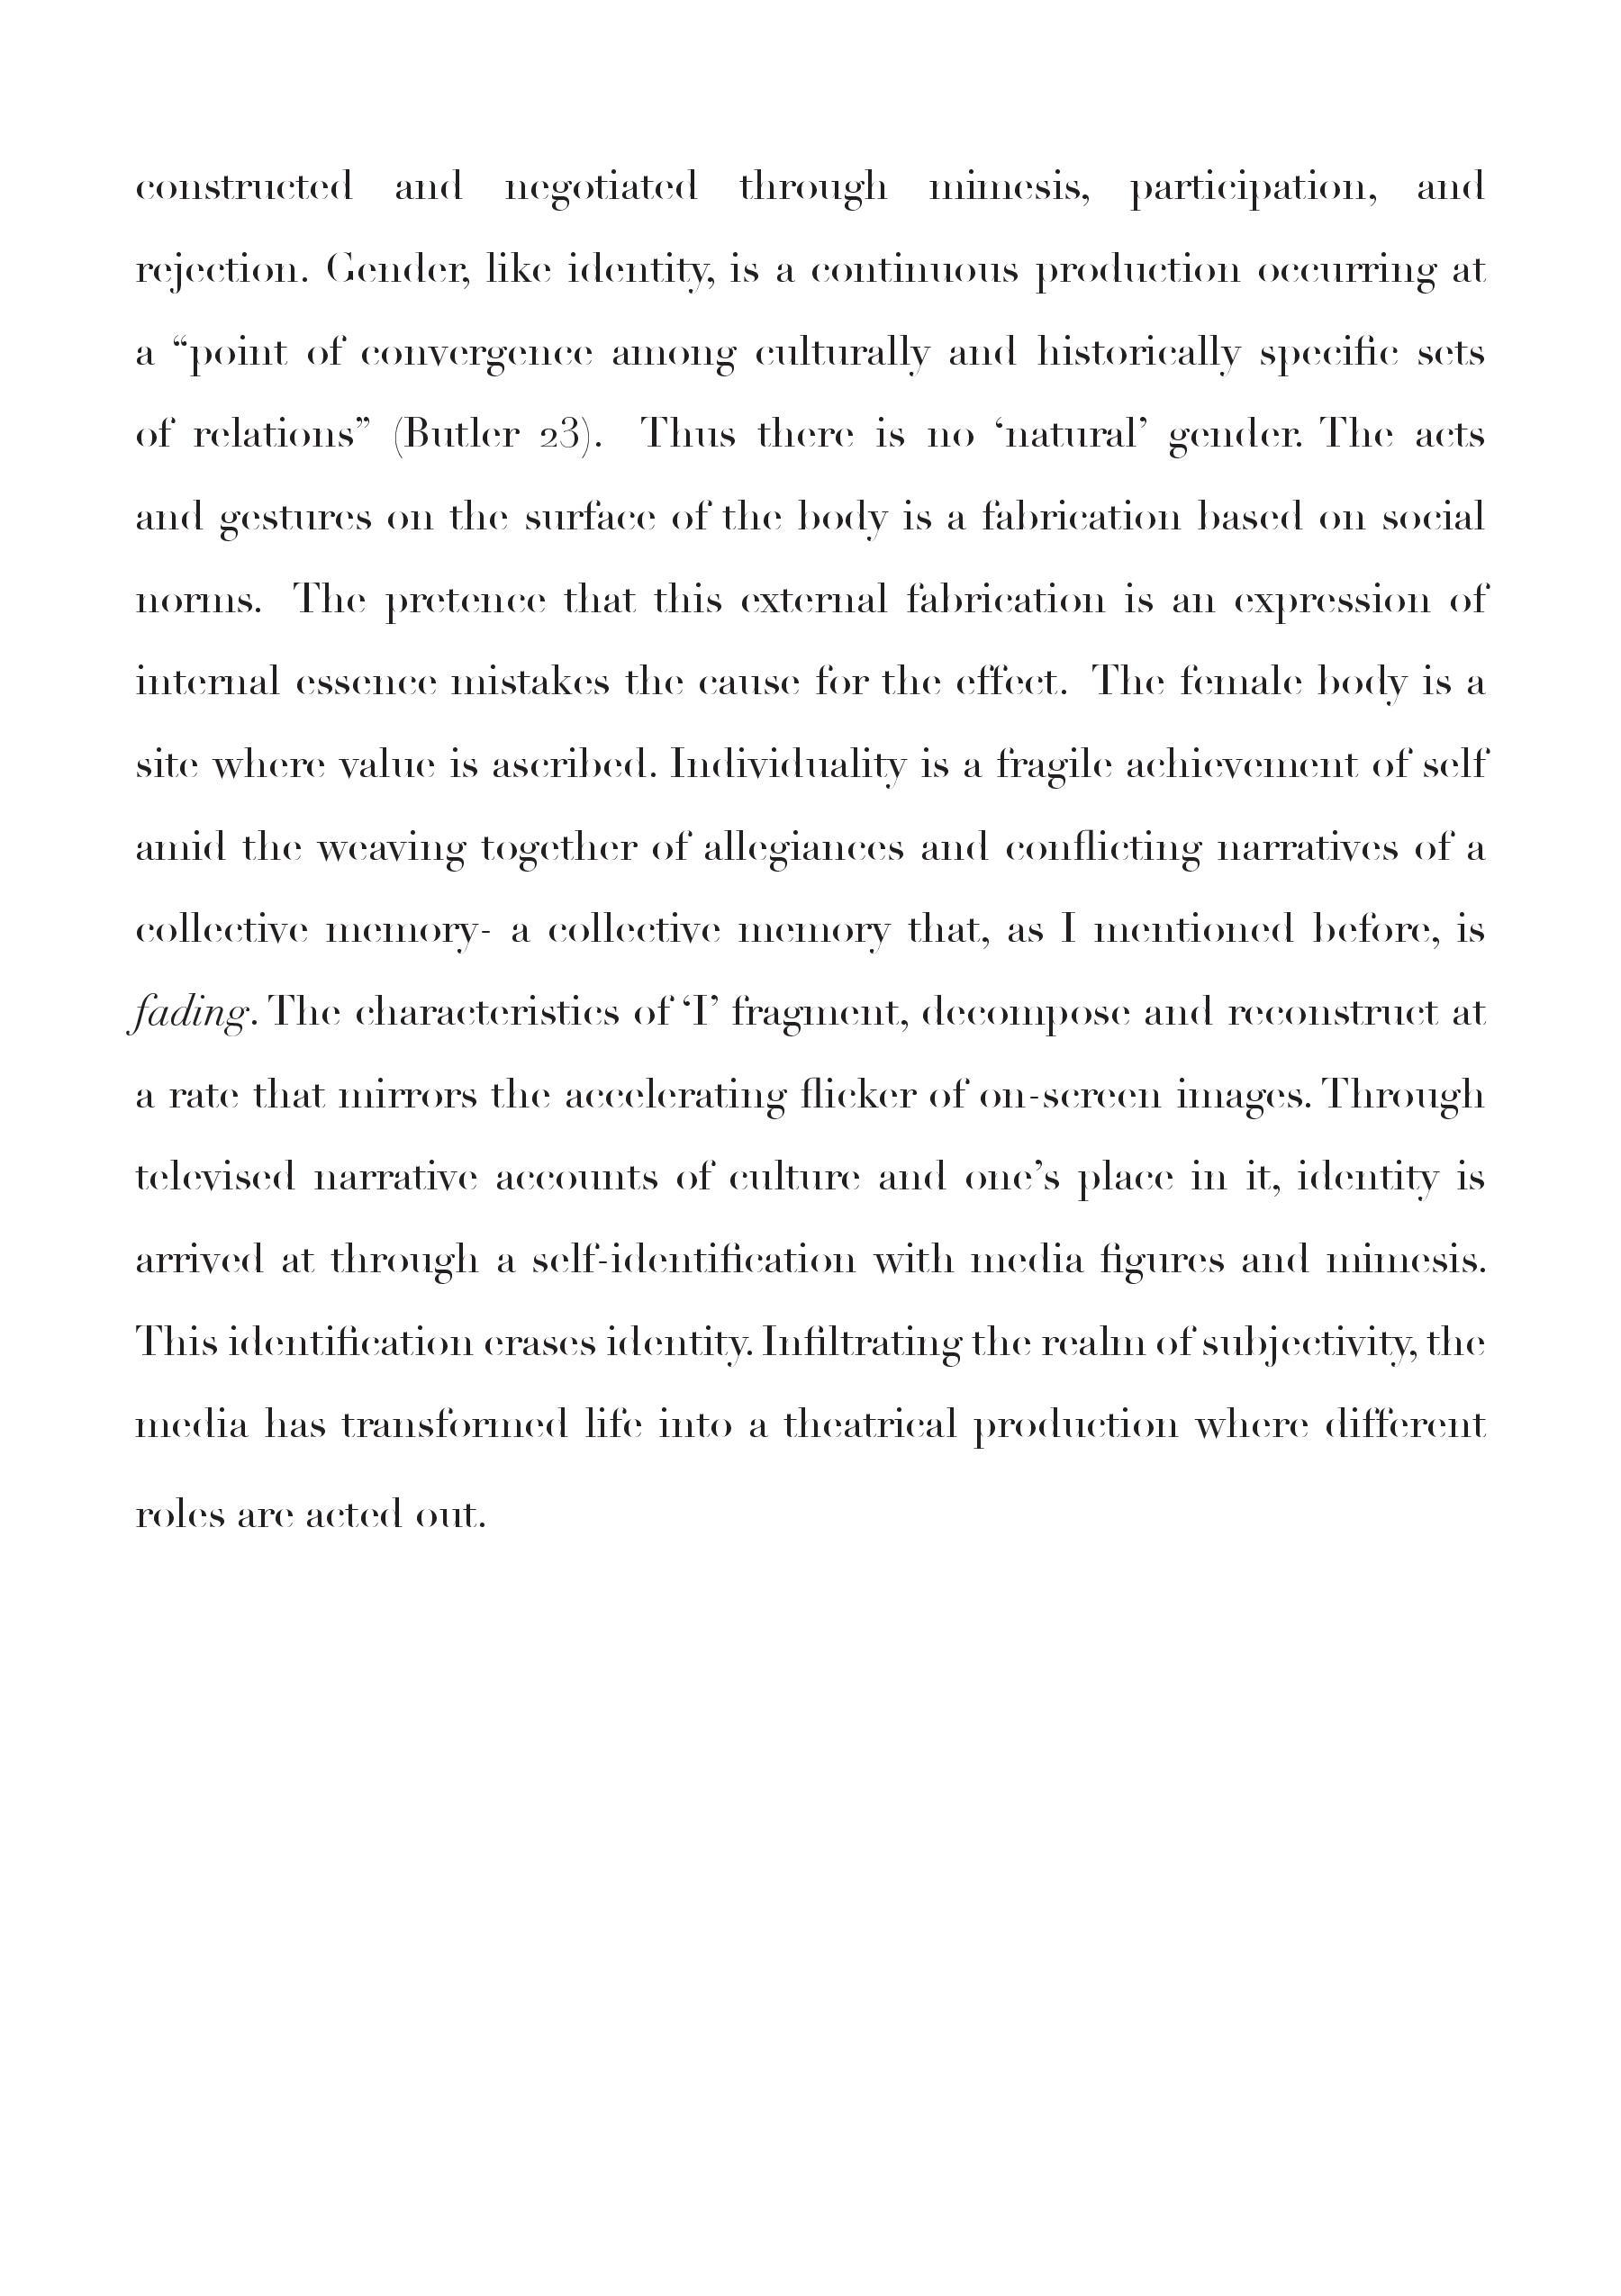 SkinDeep-page-017.jpg